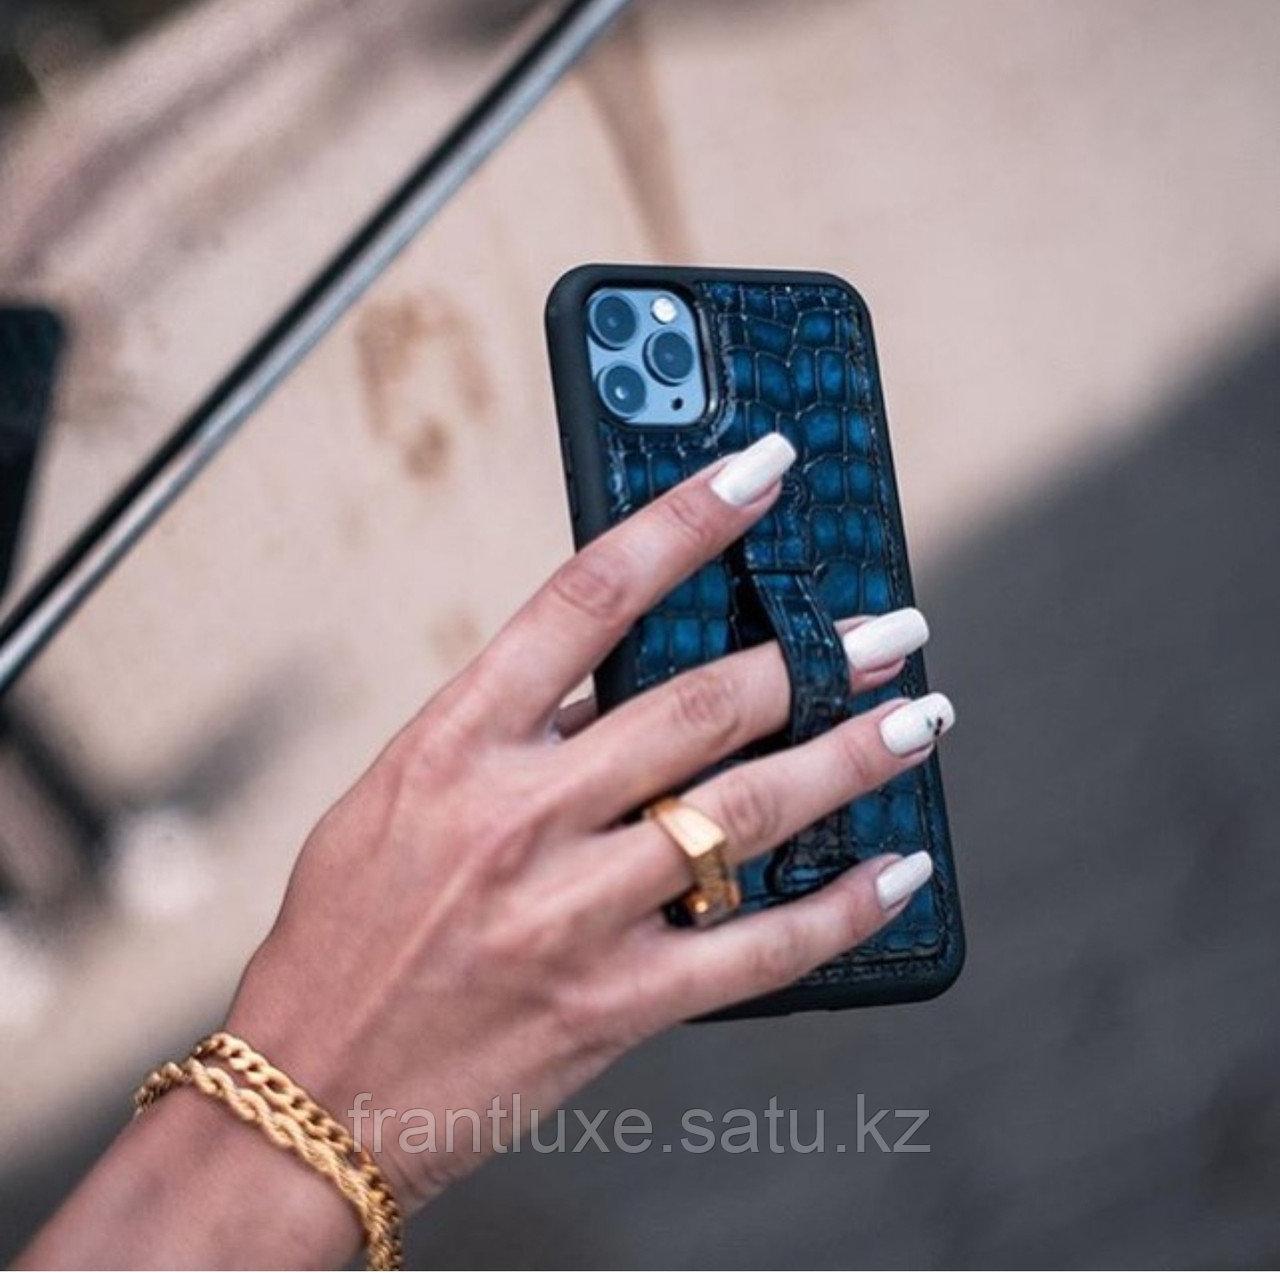 Чехол для телефона iPhone 11 Pro Max Finger-holder Blue - фото 8